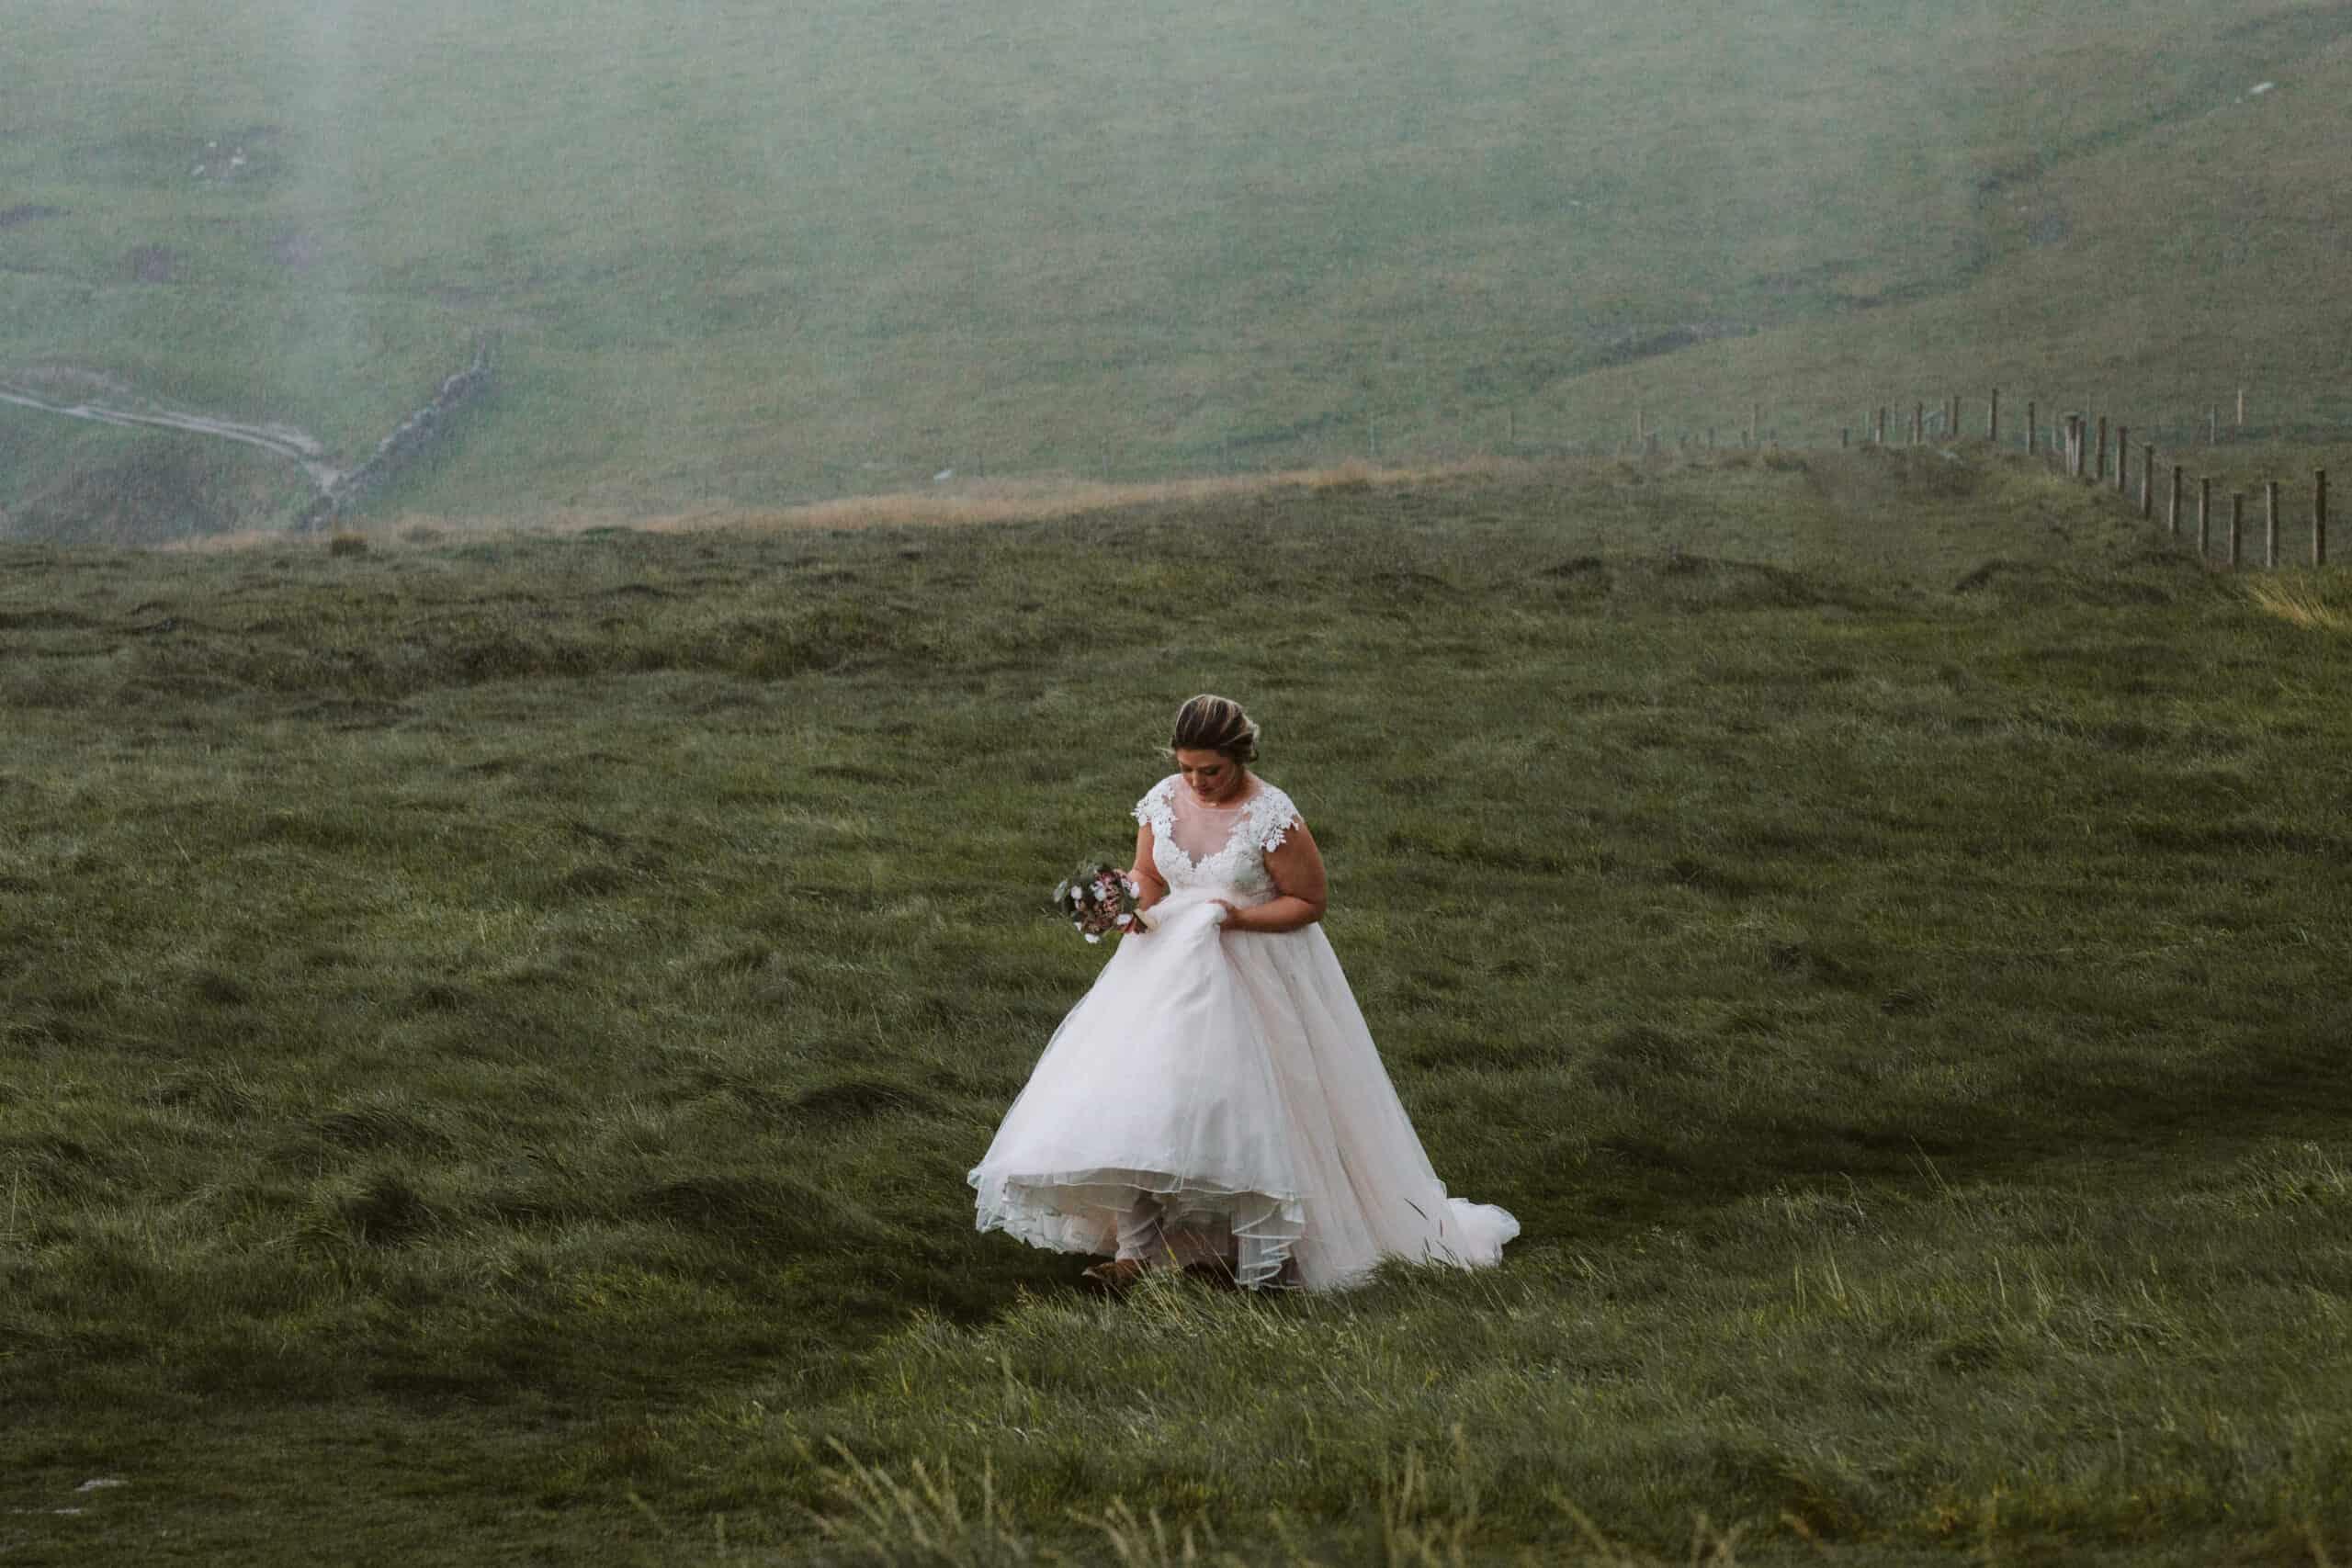 Cliffs of Moher Wedding Hags head, bride in the rain